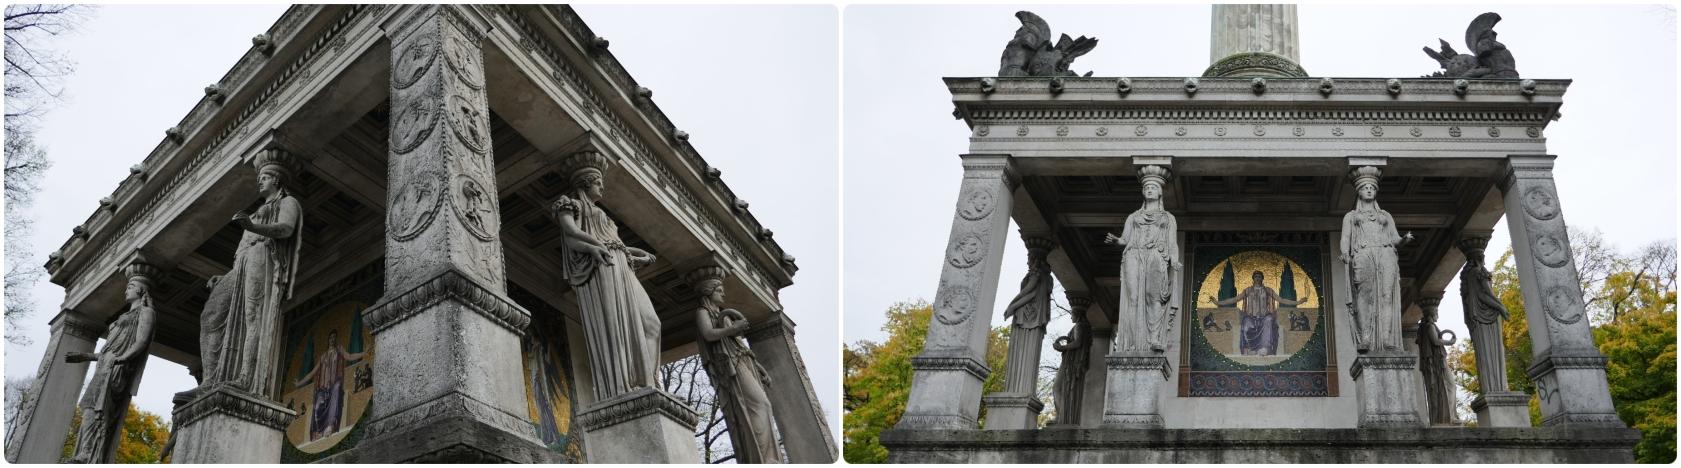 Angel of Peace Monument (Friedensengel) in Munich, Germany.